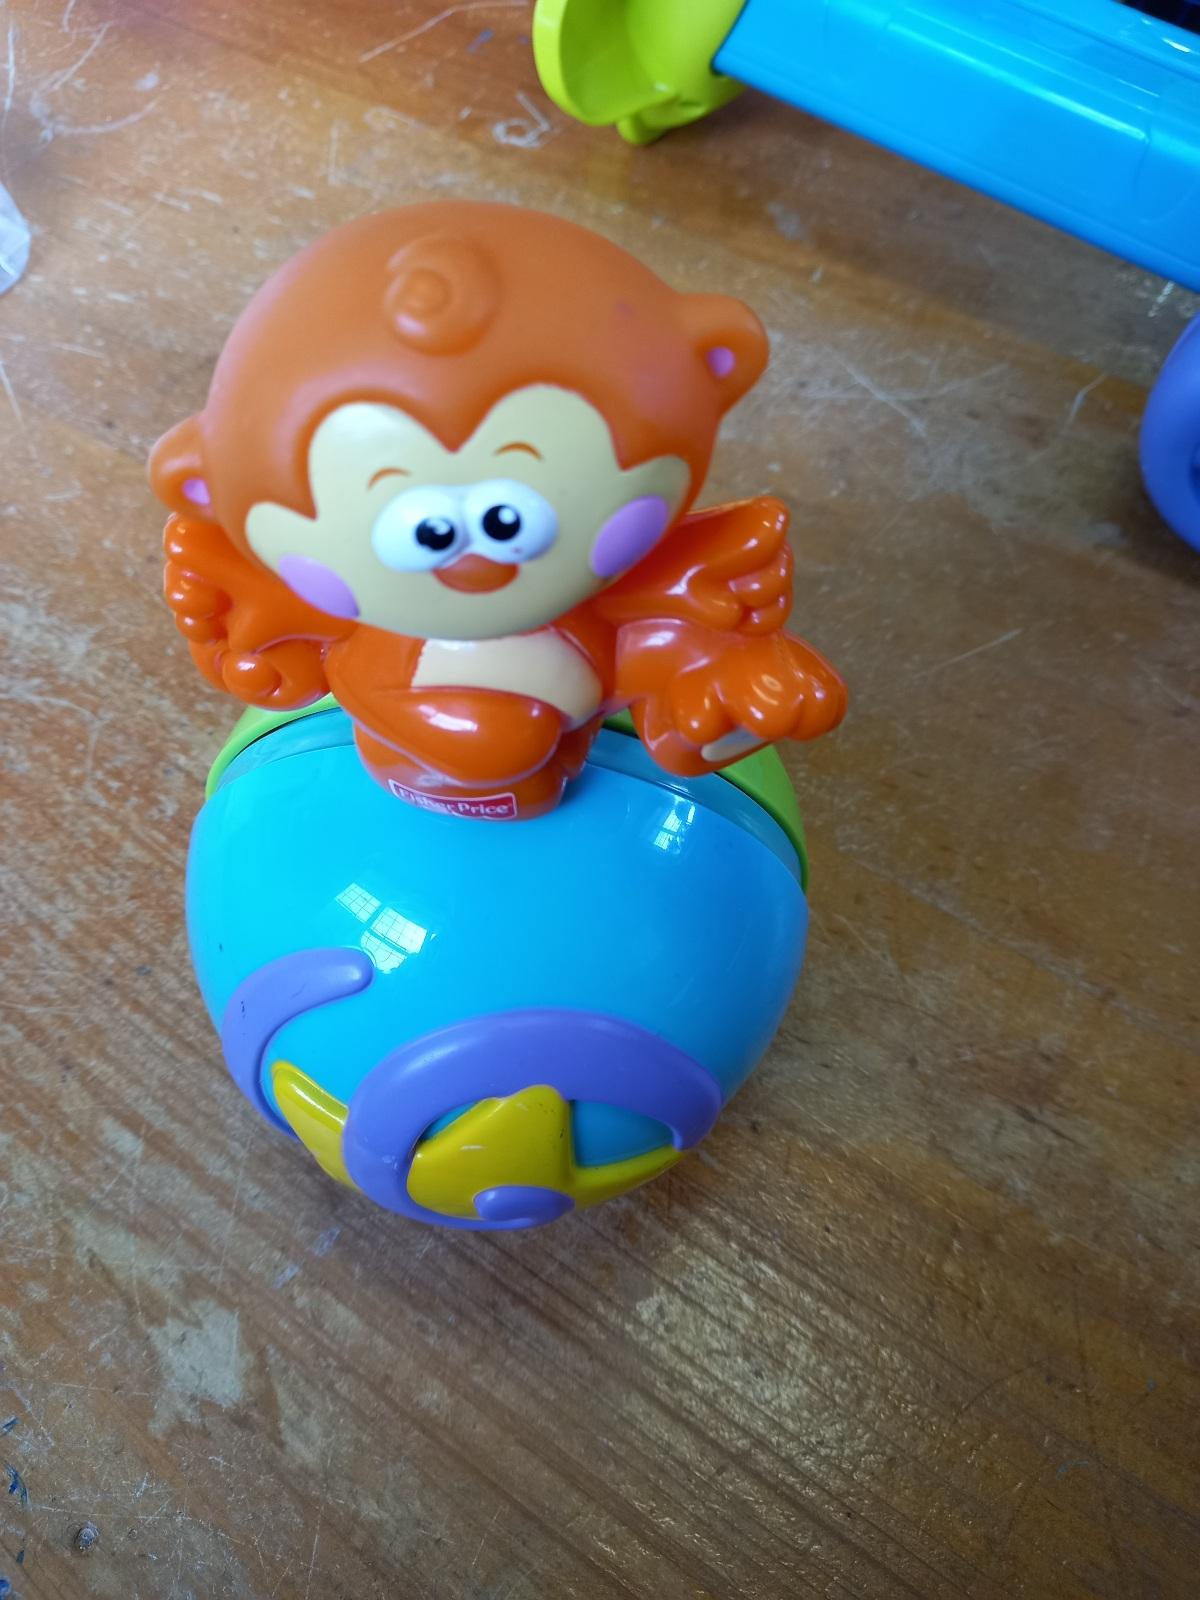 giggling monkey ball